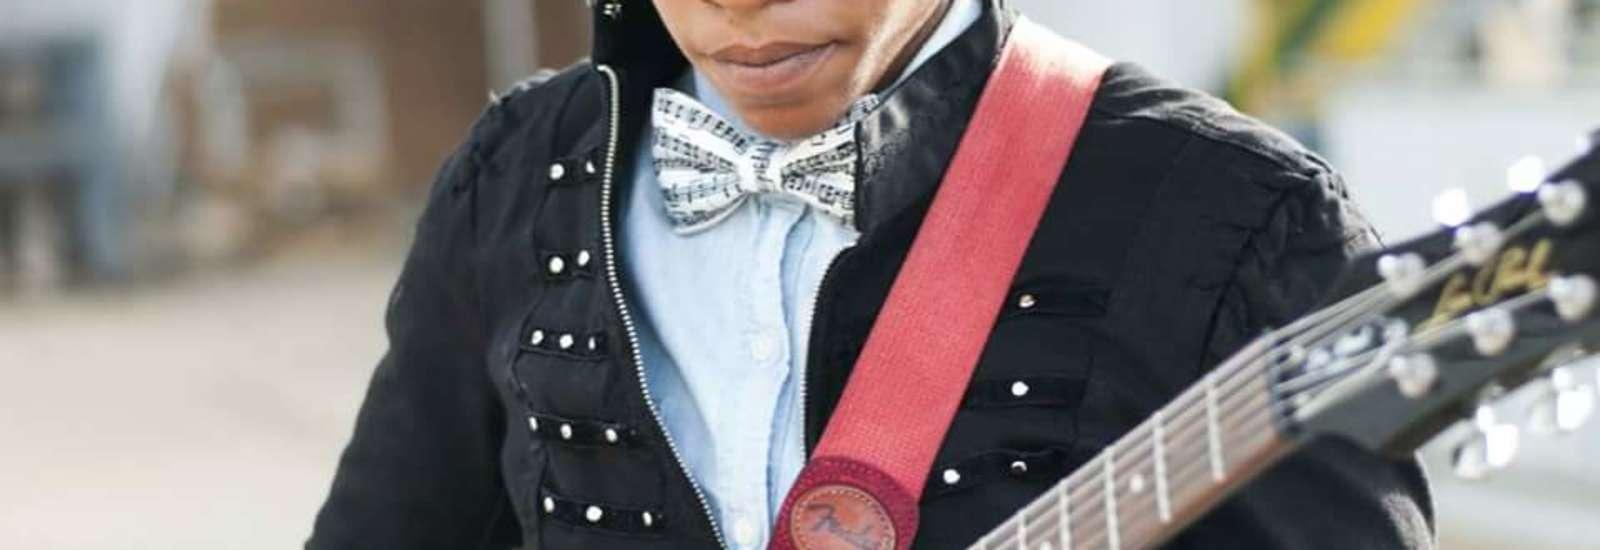 Asheville-born funk & soul musician Lyric